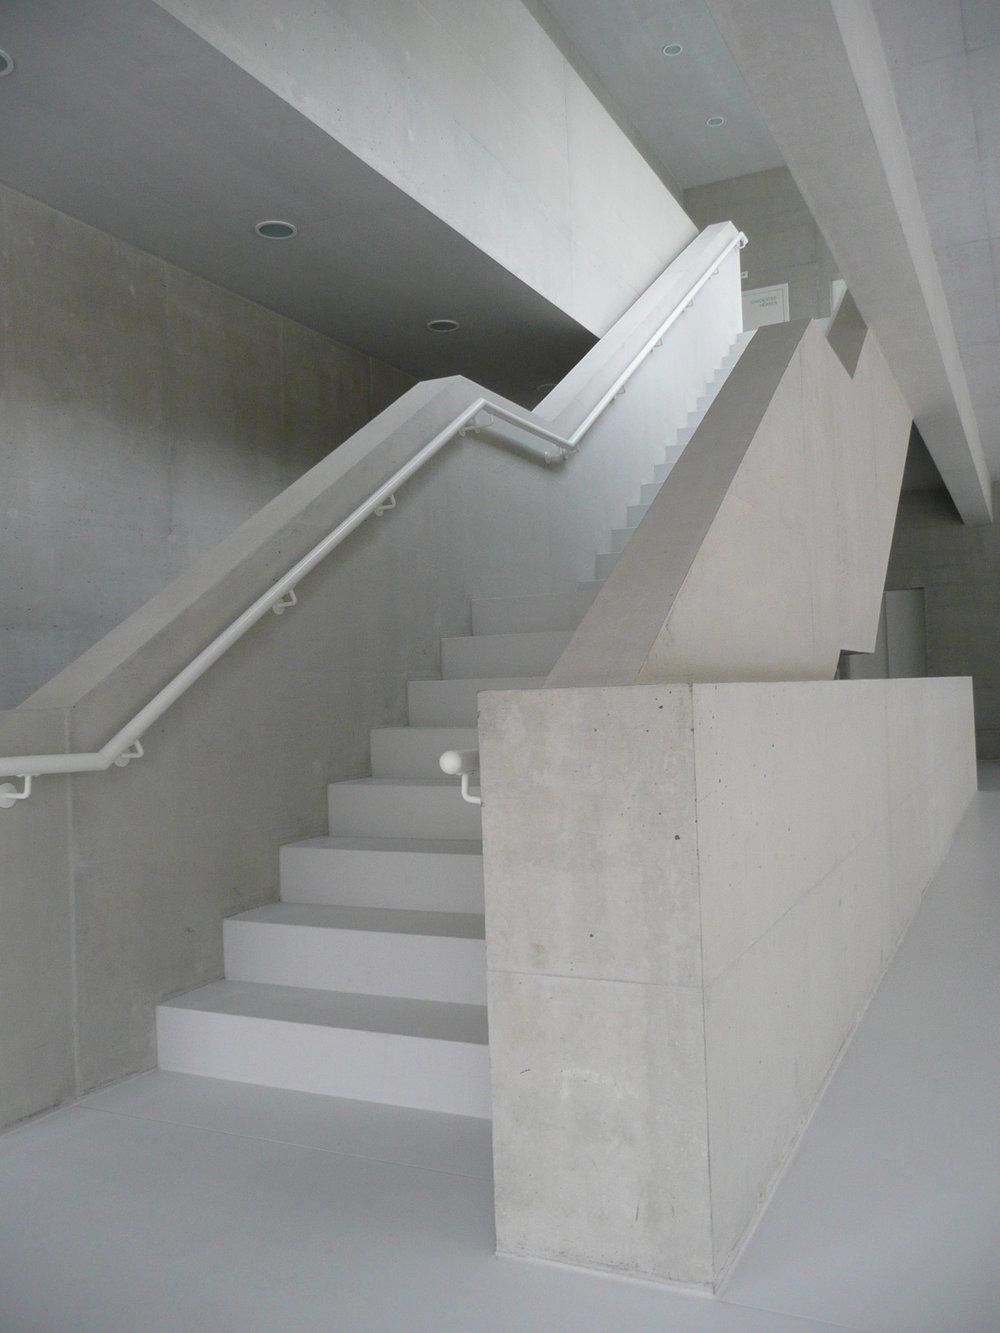 BEECK Concrete Stone Glaze Project - Gym in Liestal Switzerland 2